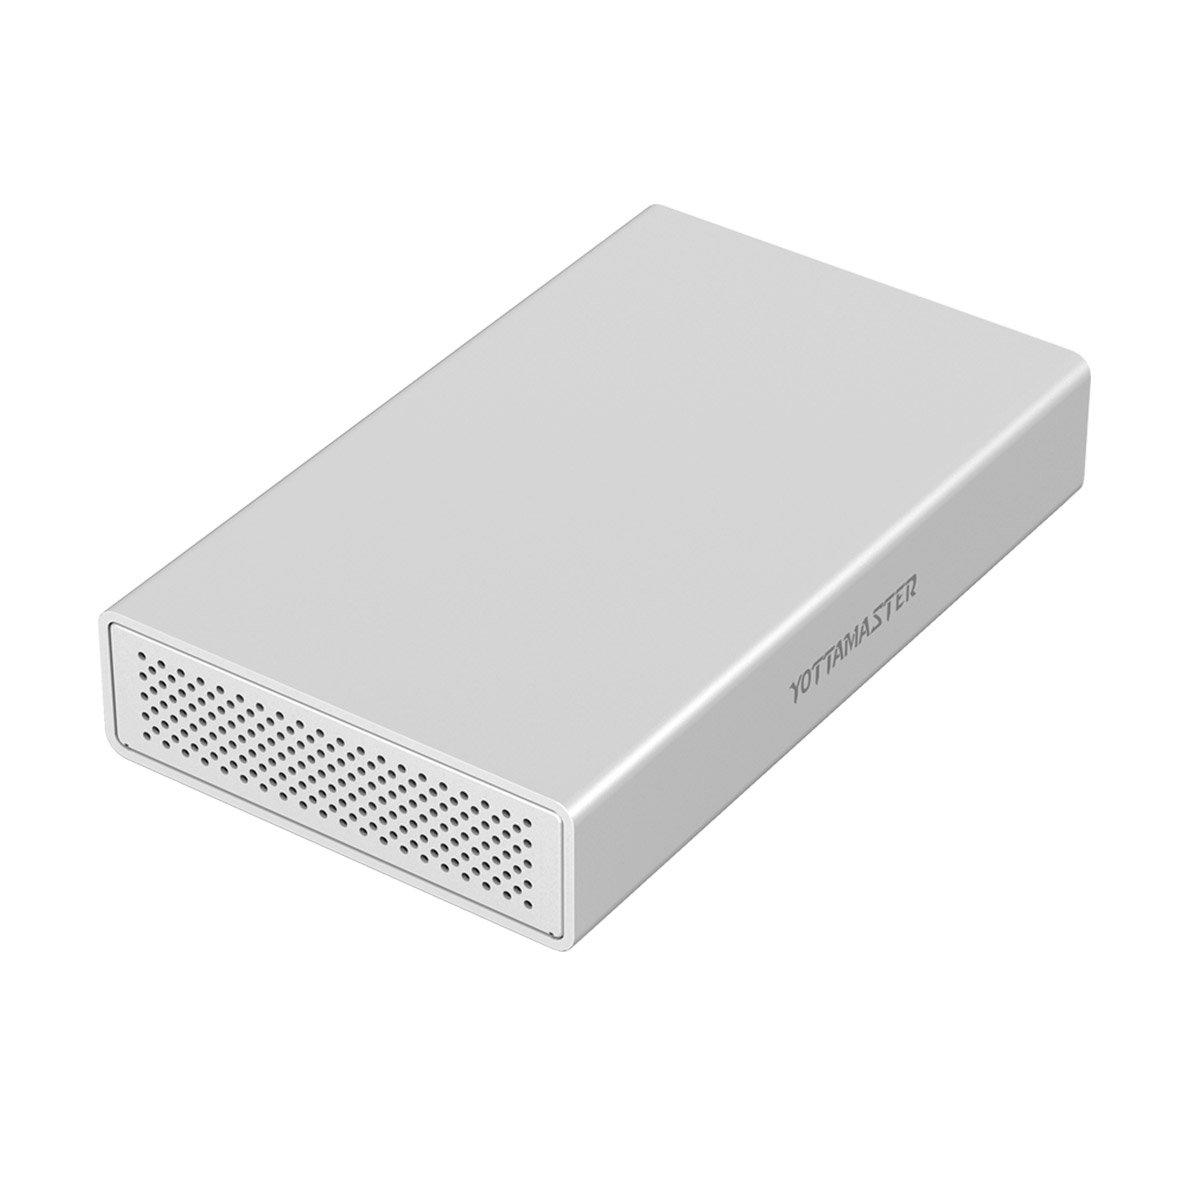 Yottamaster Aluminum USB3.1 Tipo-C Caja de Disco duro de 5 Gbps para 3.5